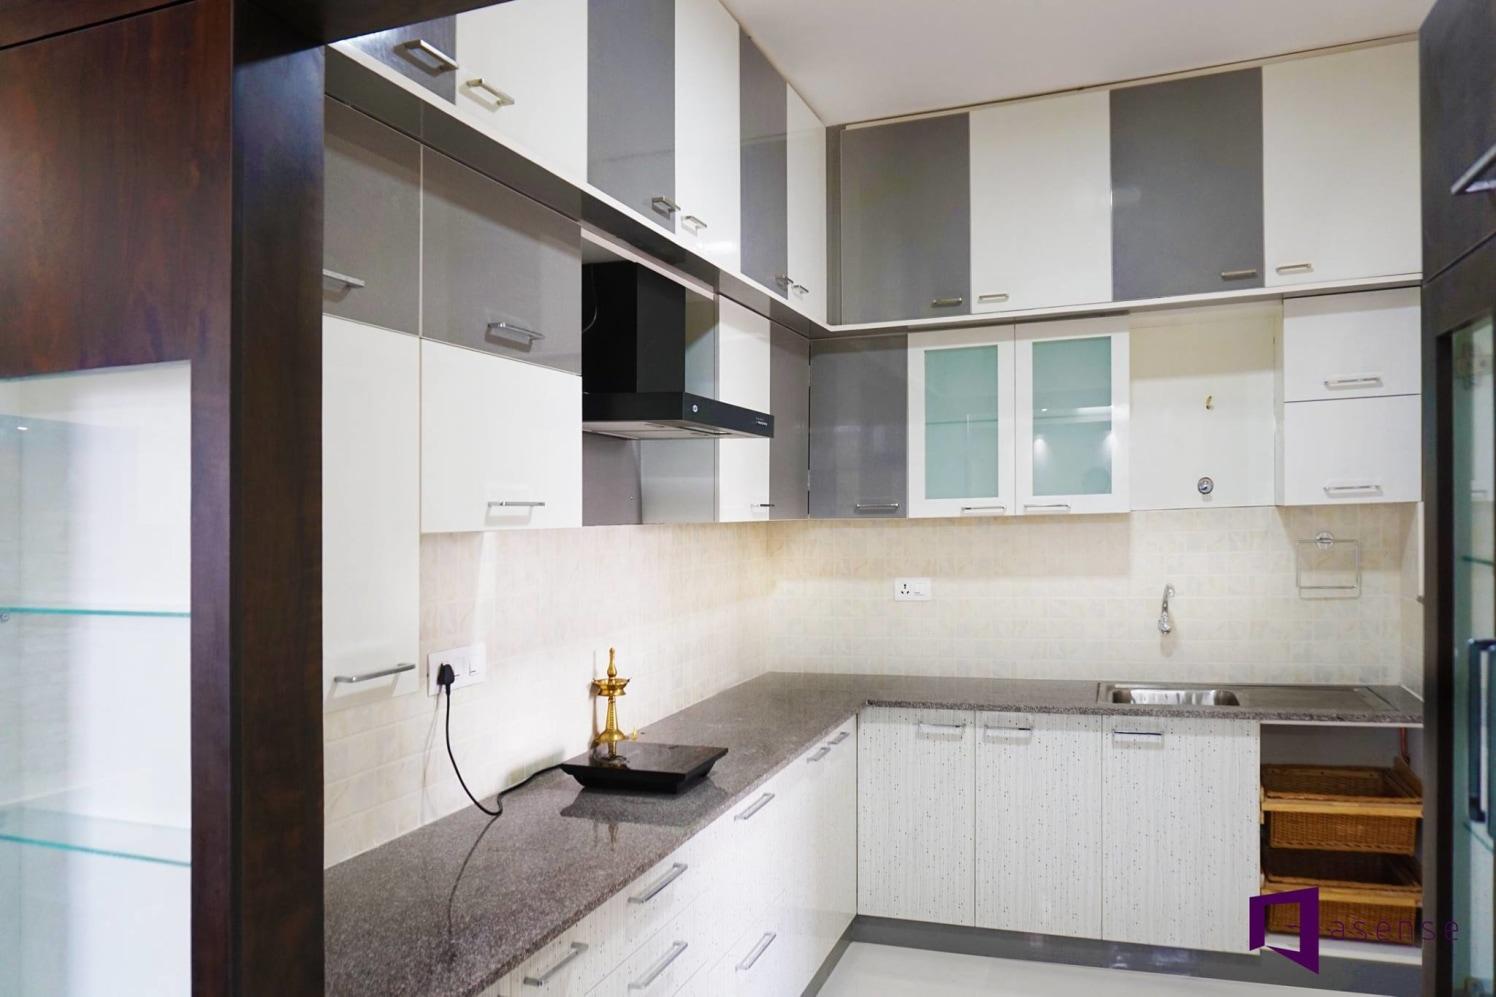 Grey And White Themed Modular Kitchen by Snigdha Ghosh Modular-kitchen Contemporary | Interior Design Photos & Ideas